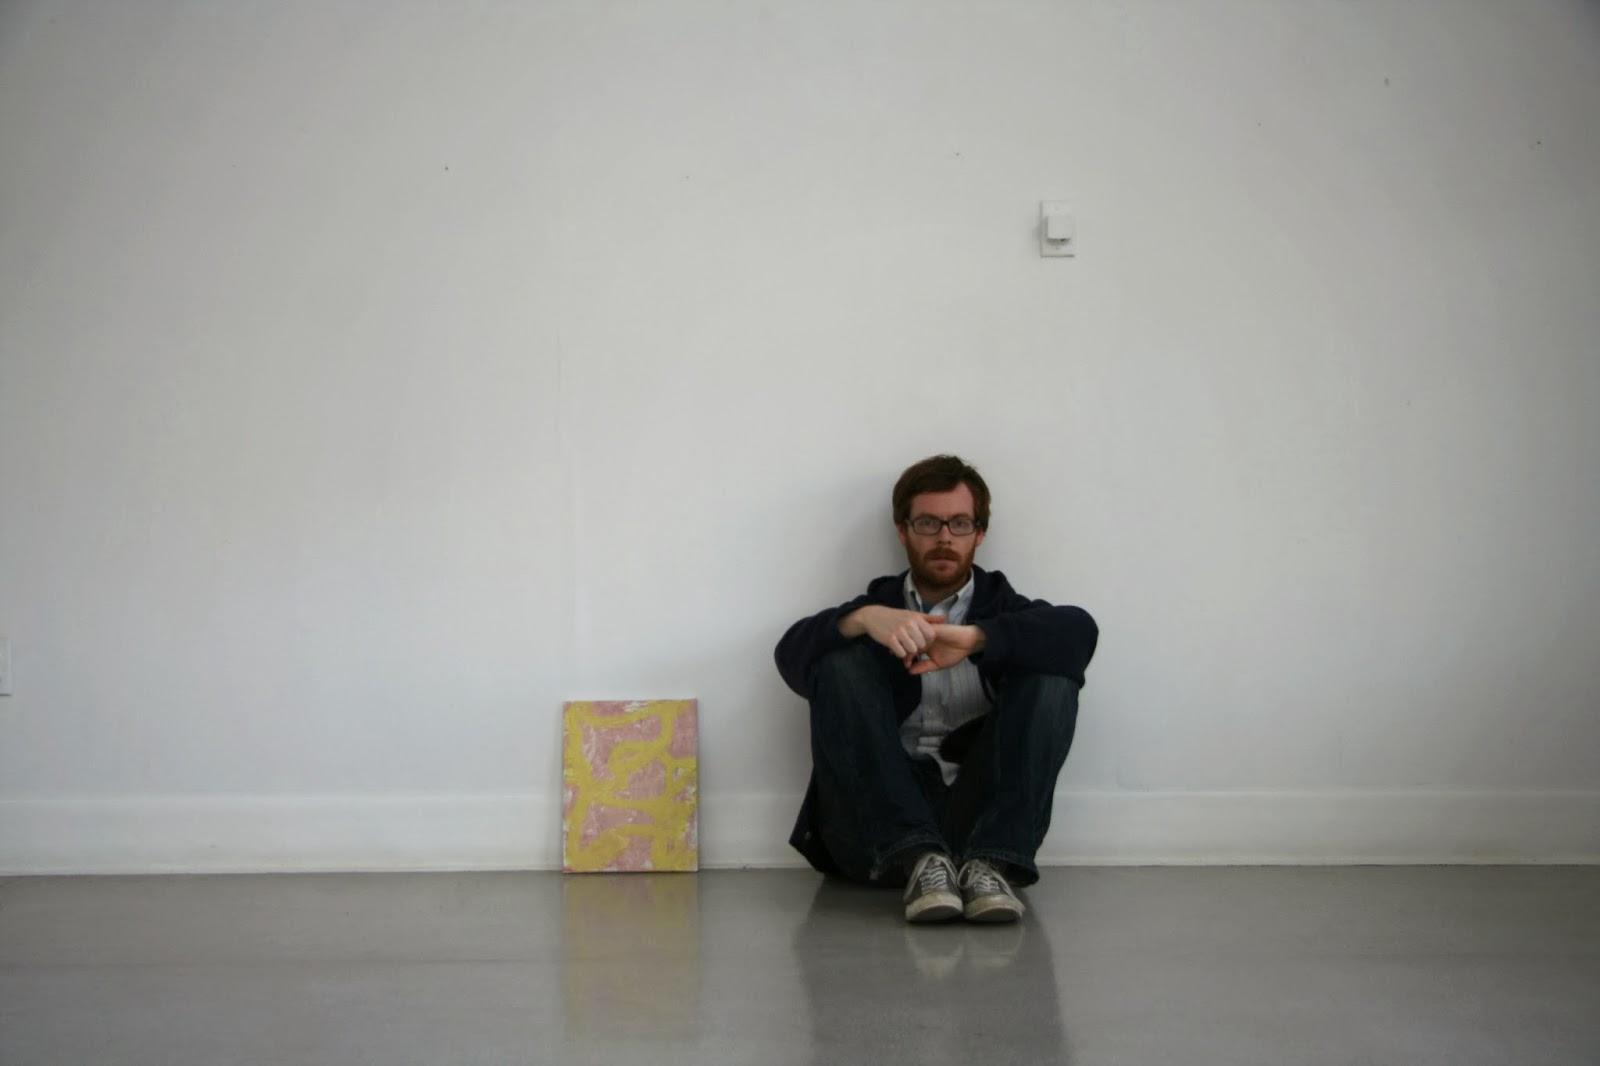 http://www.ahtcast.com/2014/02/artist-interview-peter-shear-outtakes.html